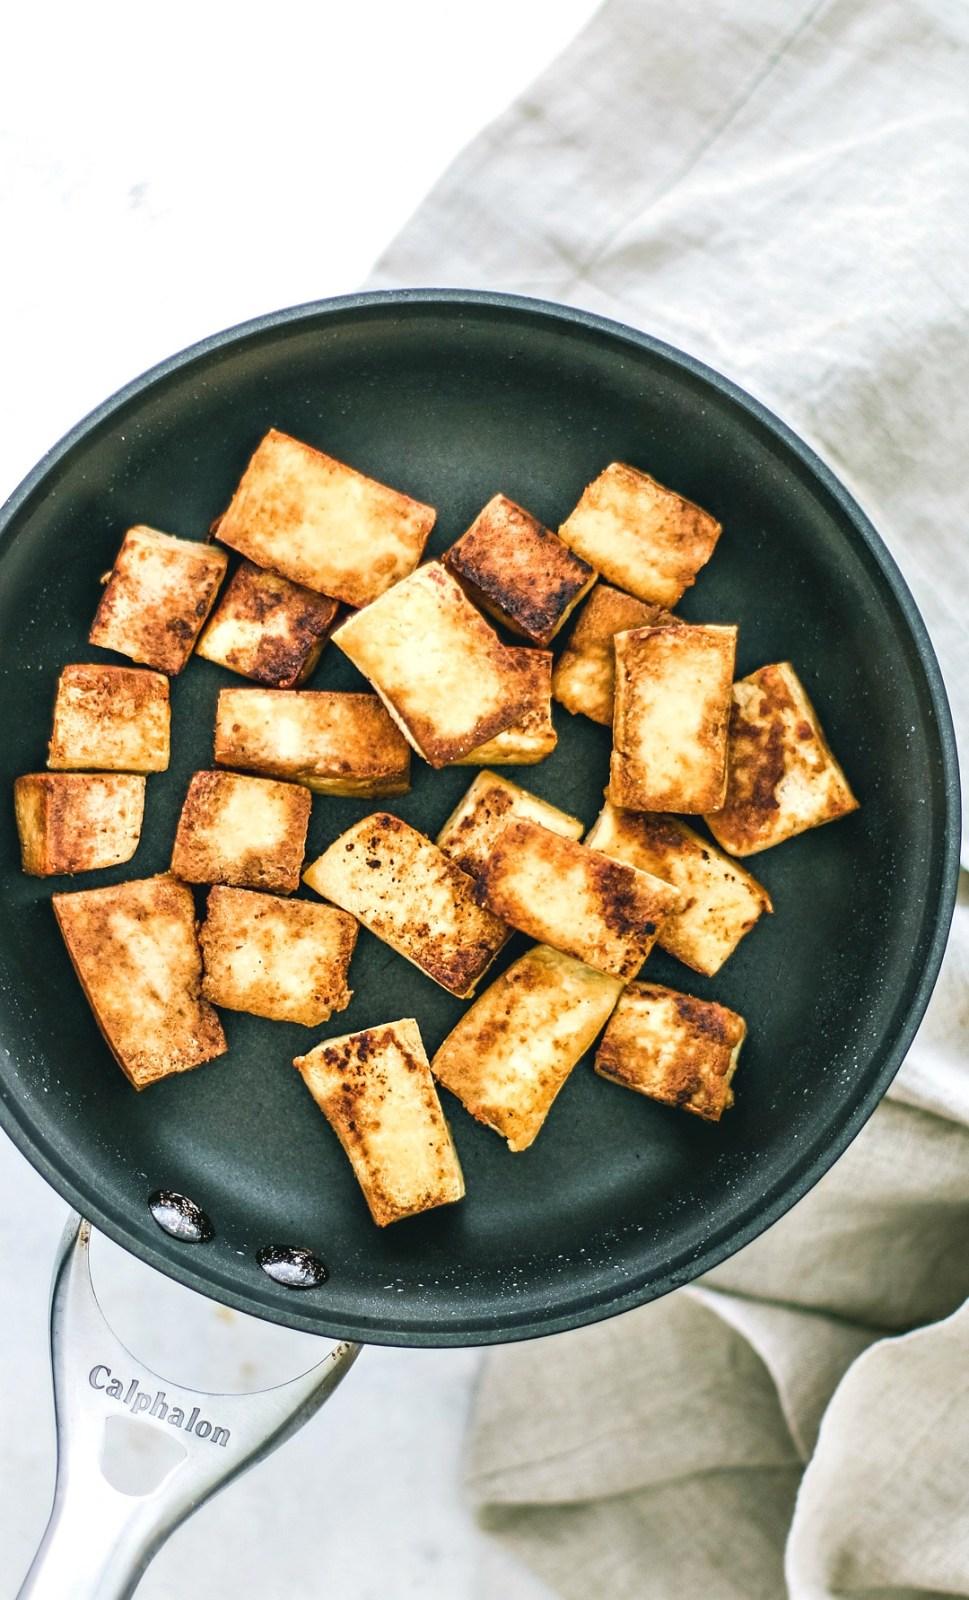 Pan of crispy tofu.